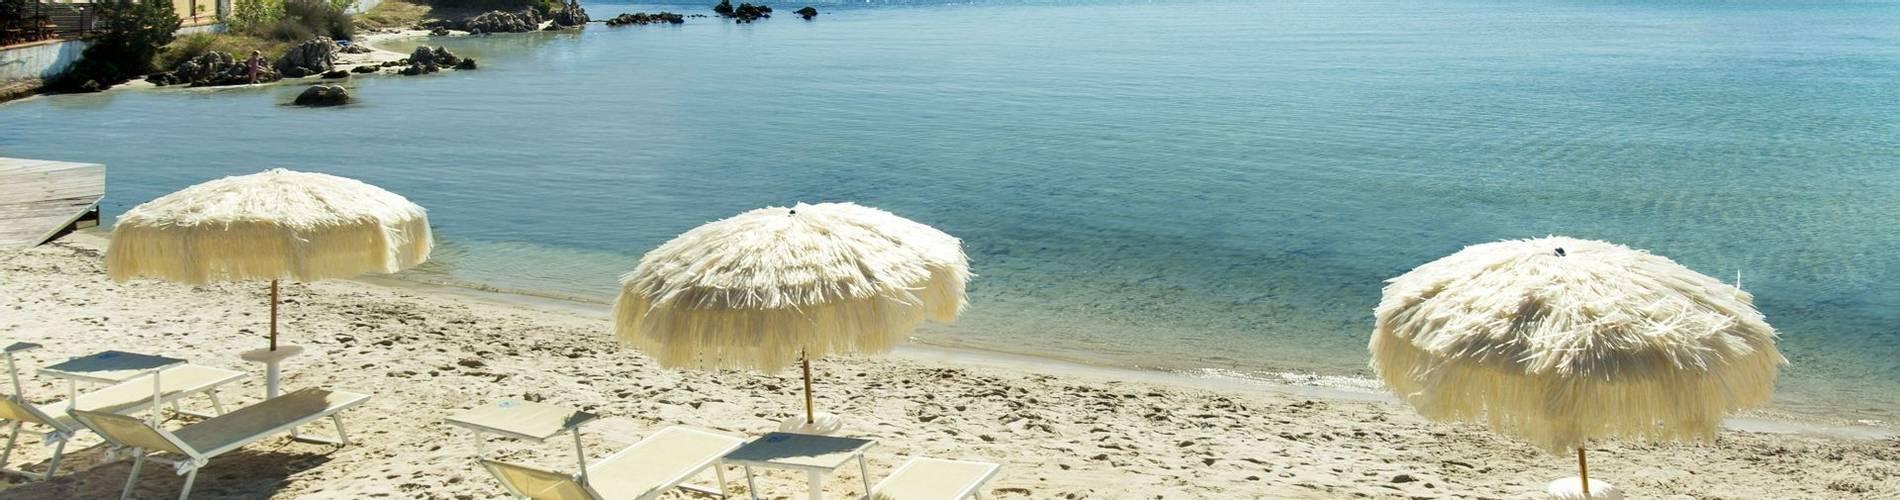 Gabbiano Azzurro Hotel _ Suites - Private beach - stampa3.jpg